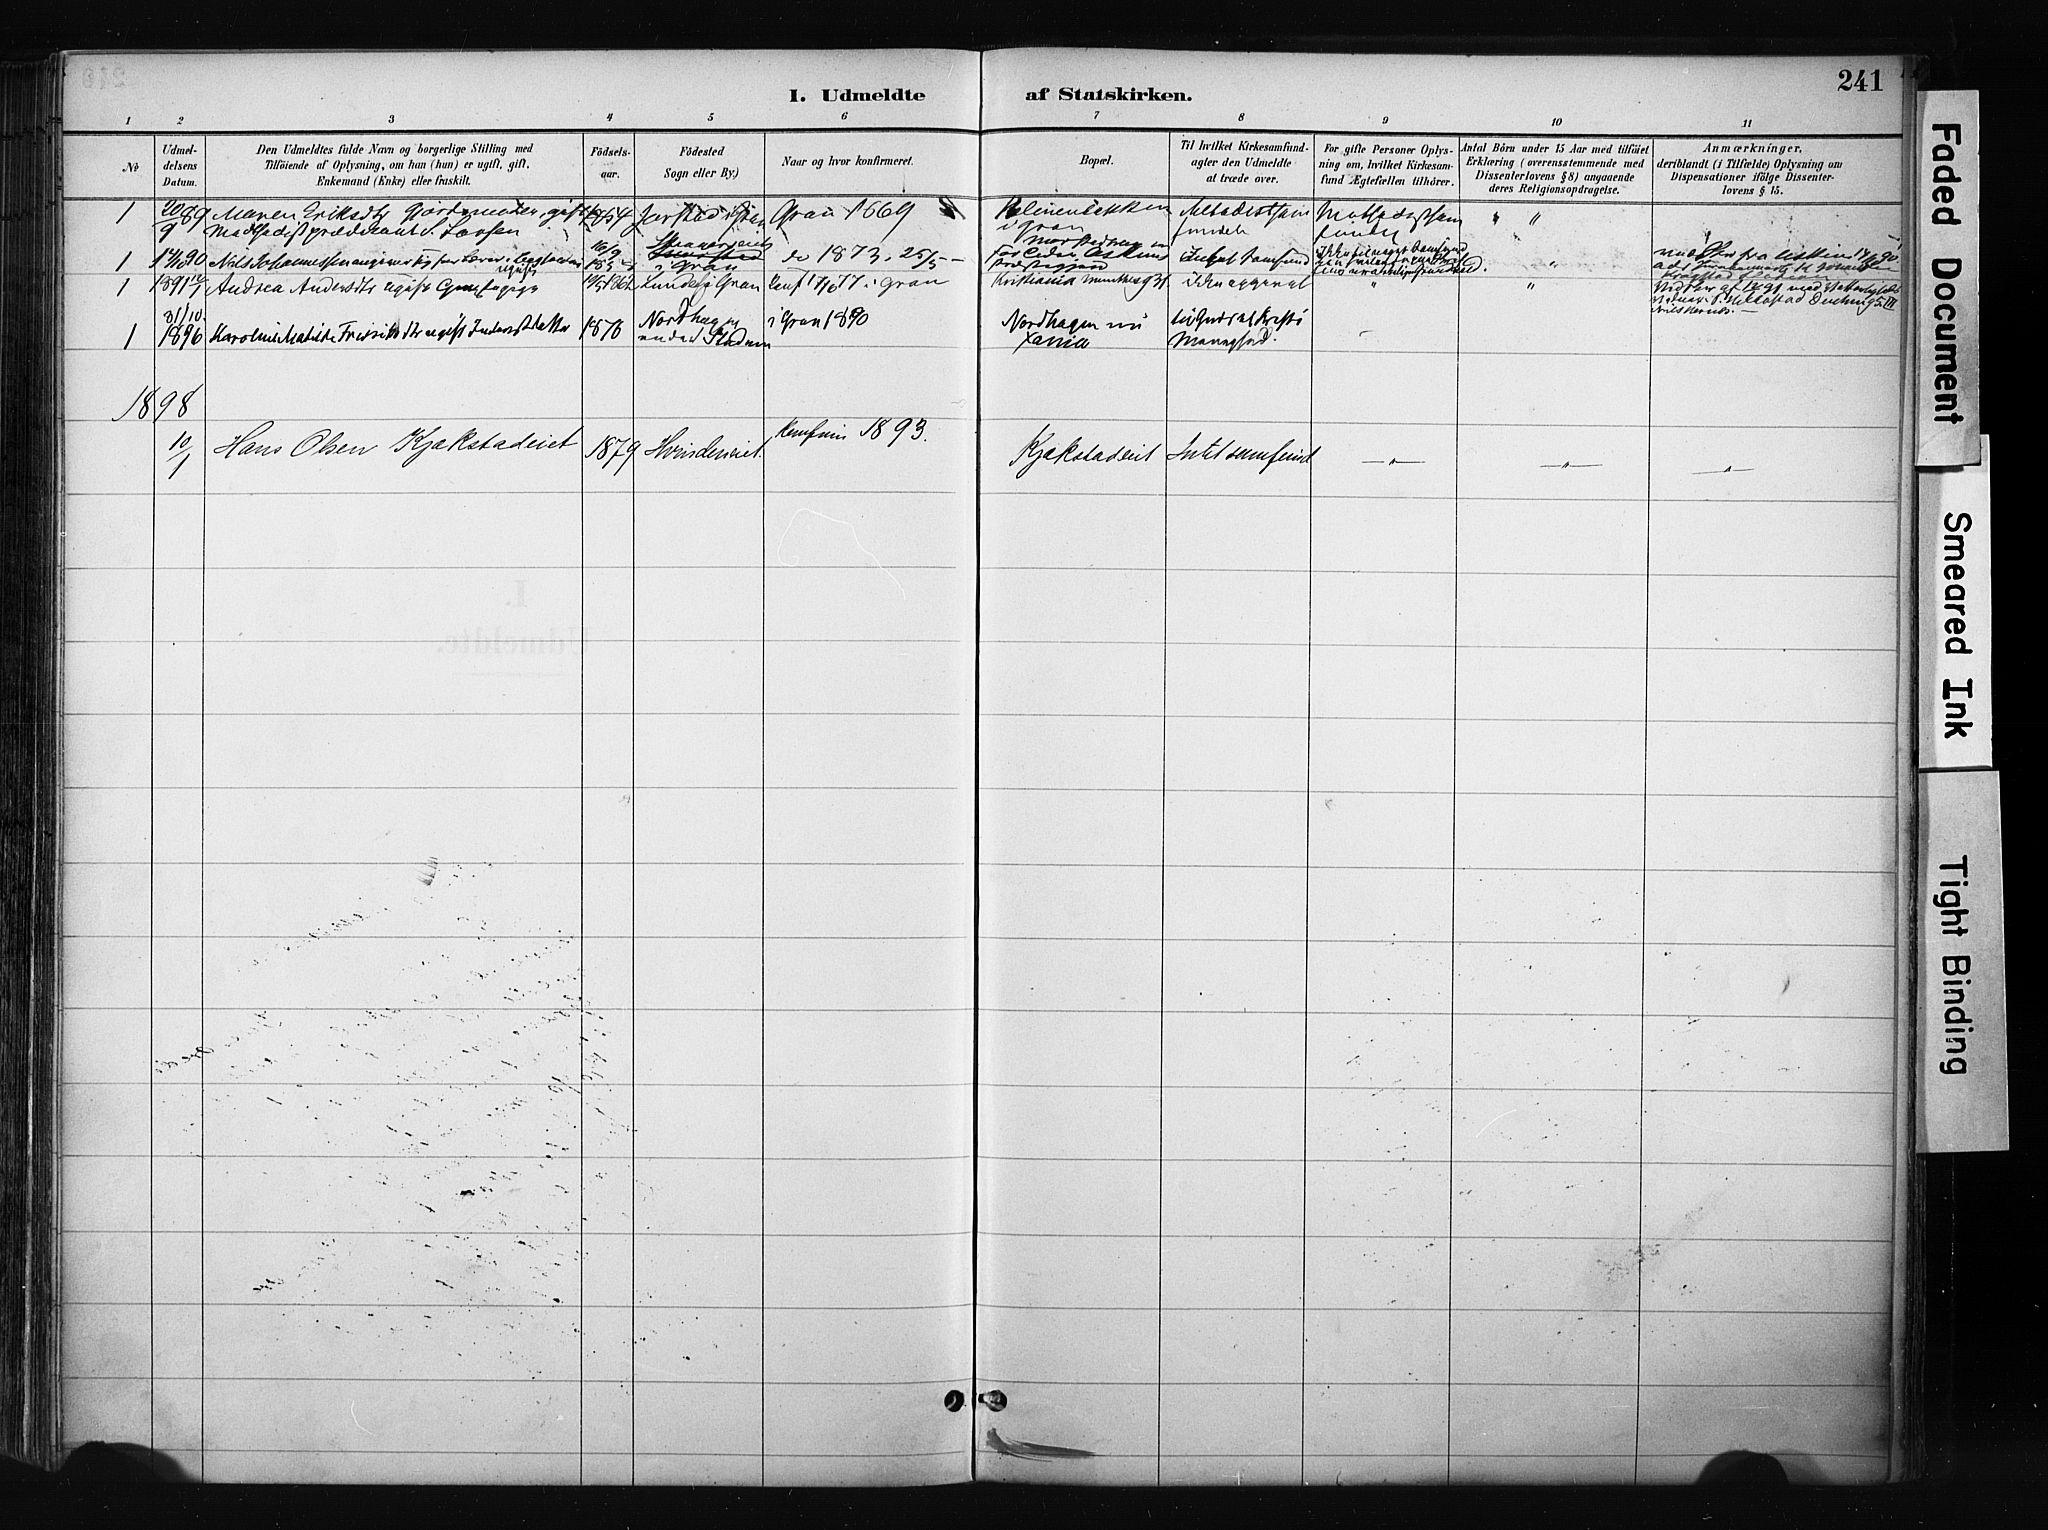 SAH, Gran prestekontor, Ministerialbok nr. 17, 1889-1897, s. 241